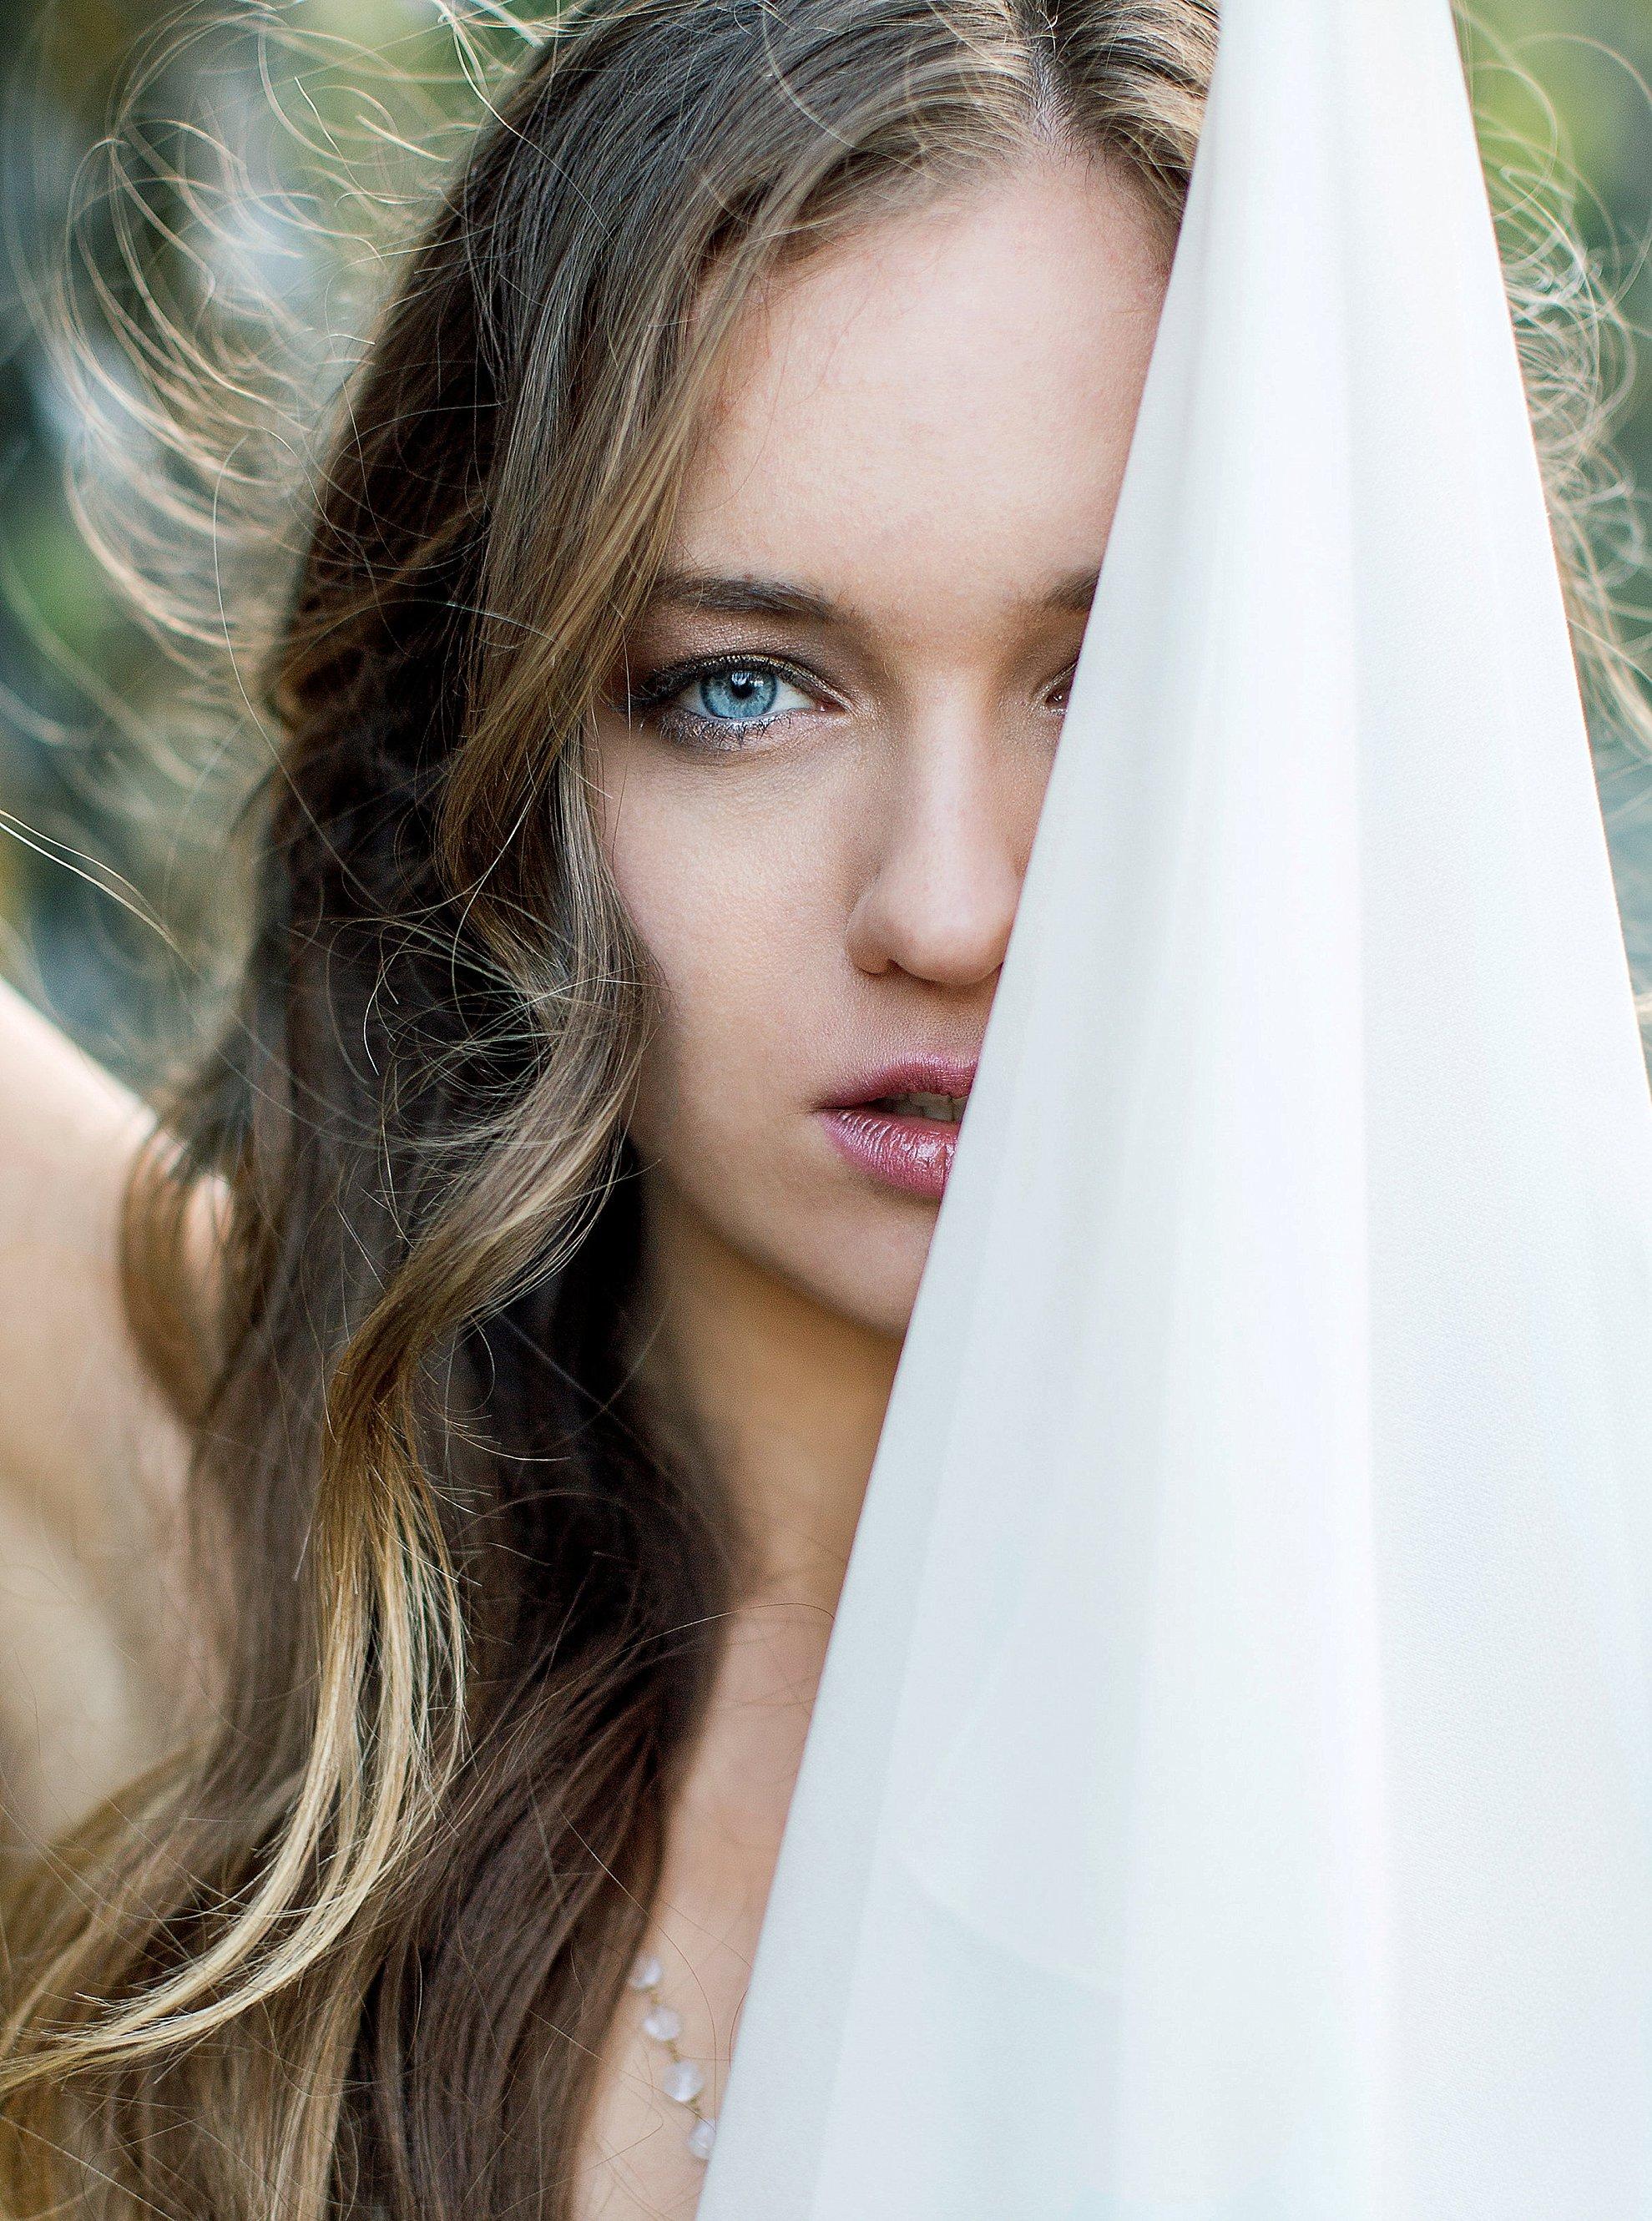 Bianca-Rijkenbarg-fotografie-for-this-romance-bruidsinspiratie-blog_0012